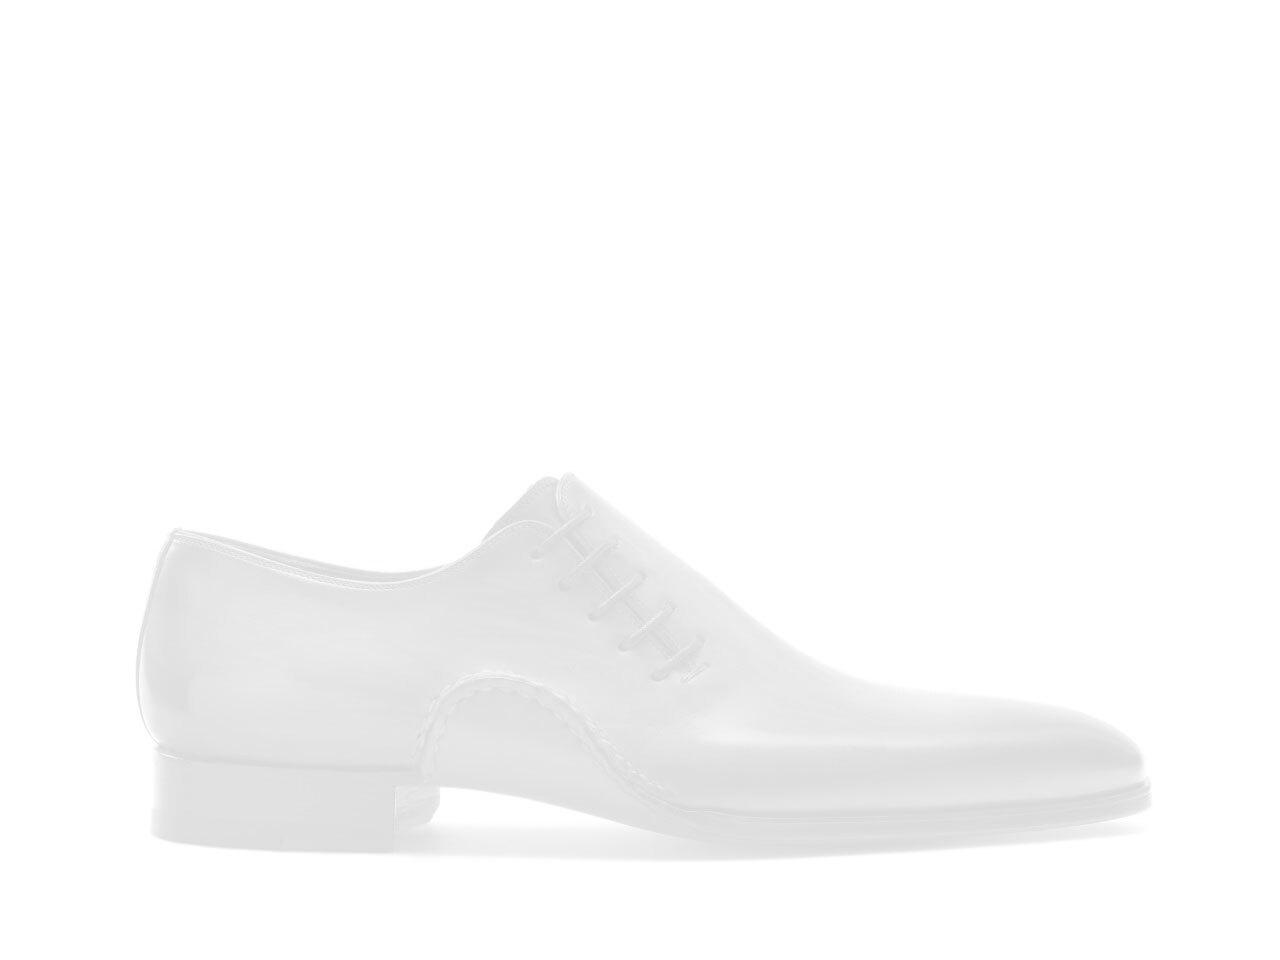 Sole of the Magnanni Medrano Cognac Men's Designer Boots